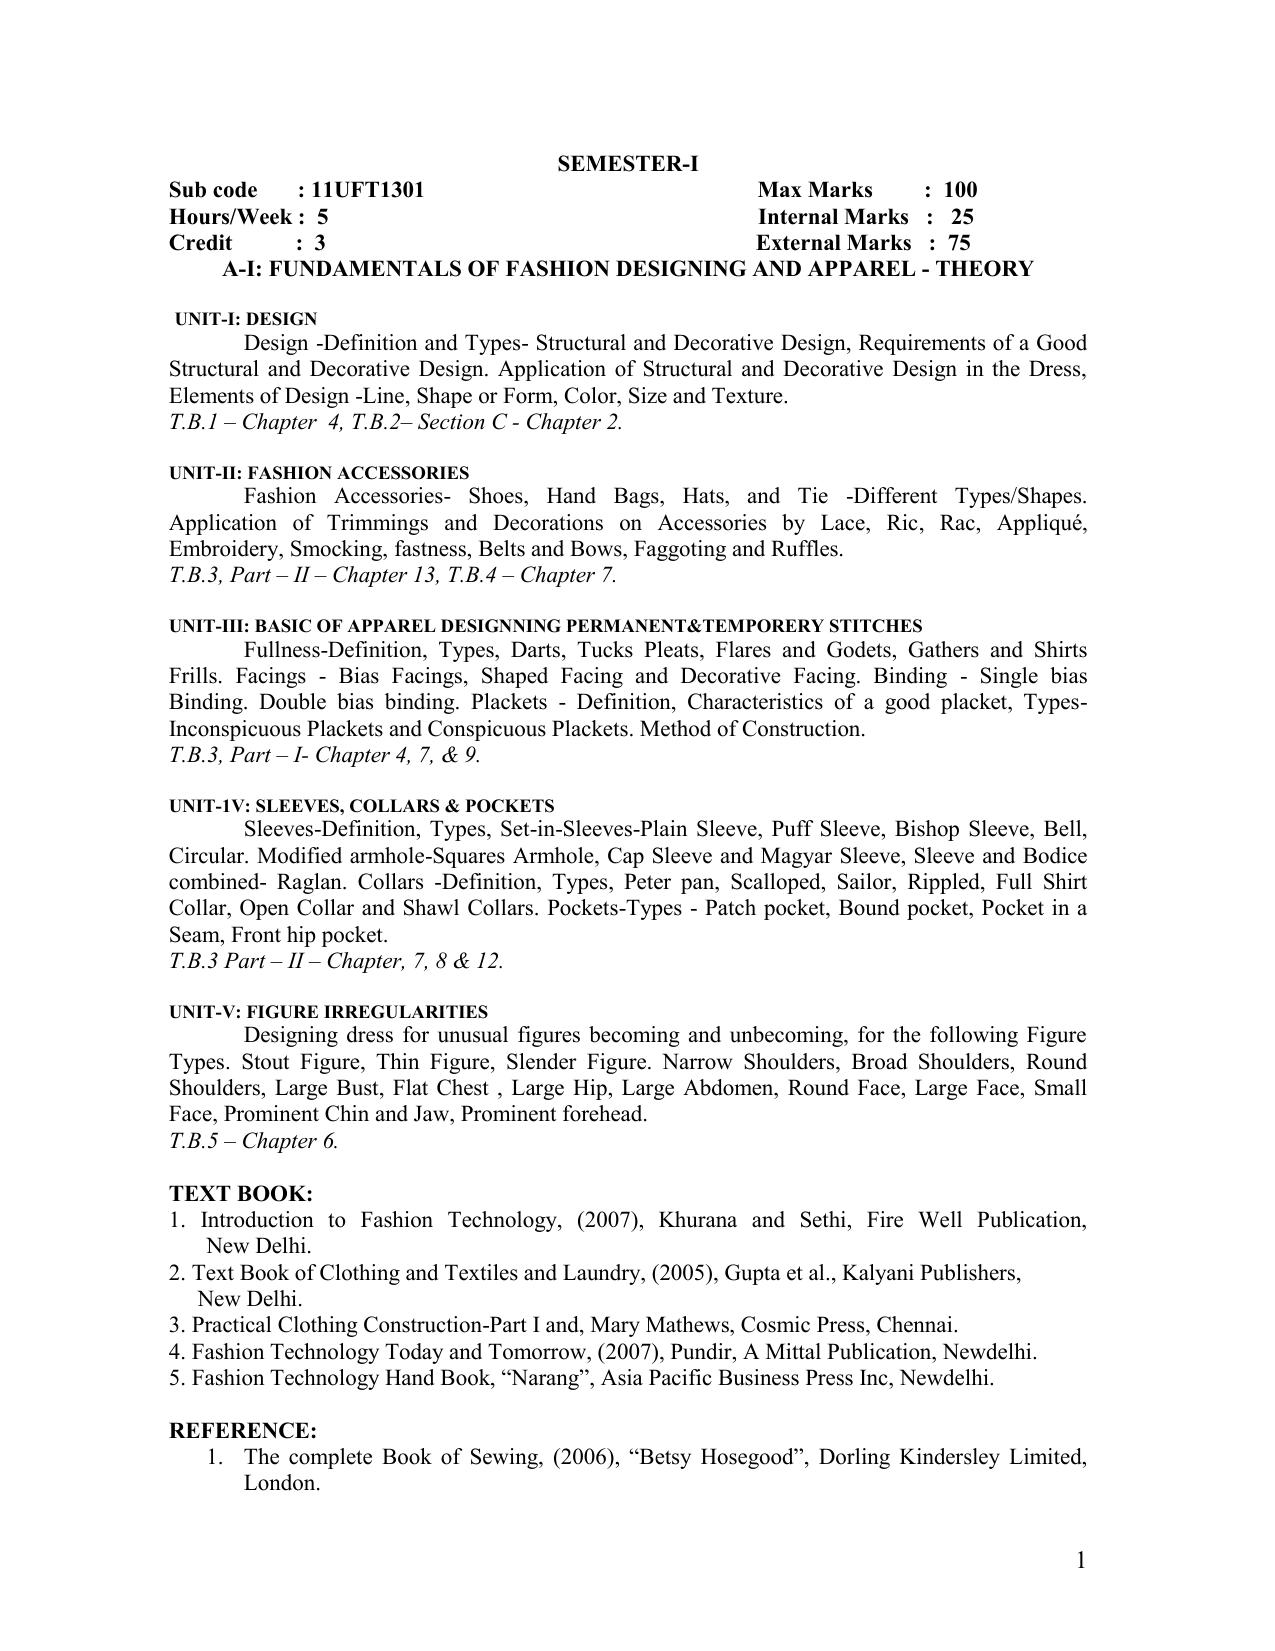 Semester I Sub Code 11uft1301